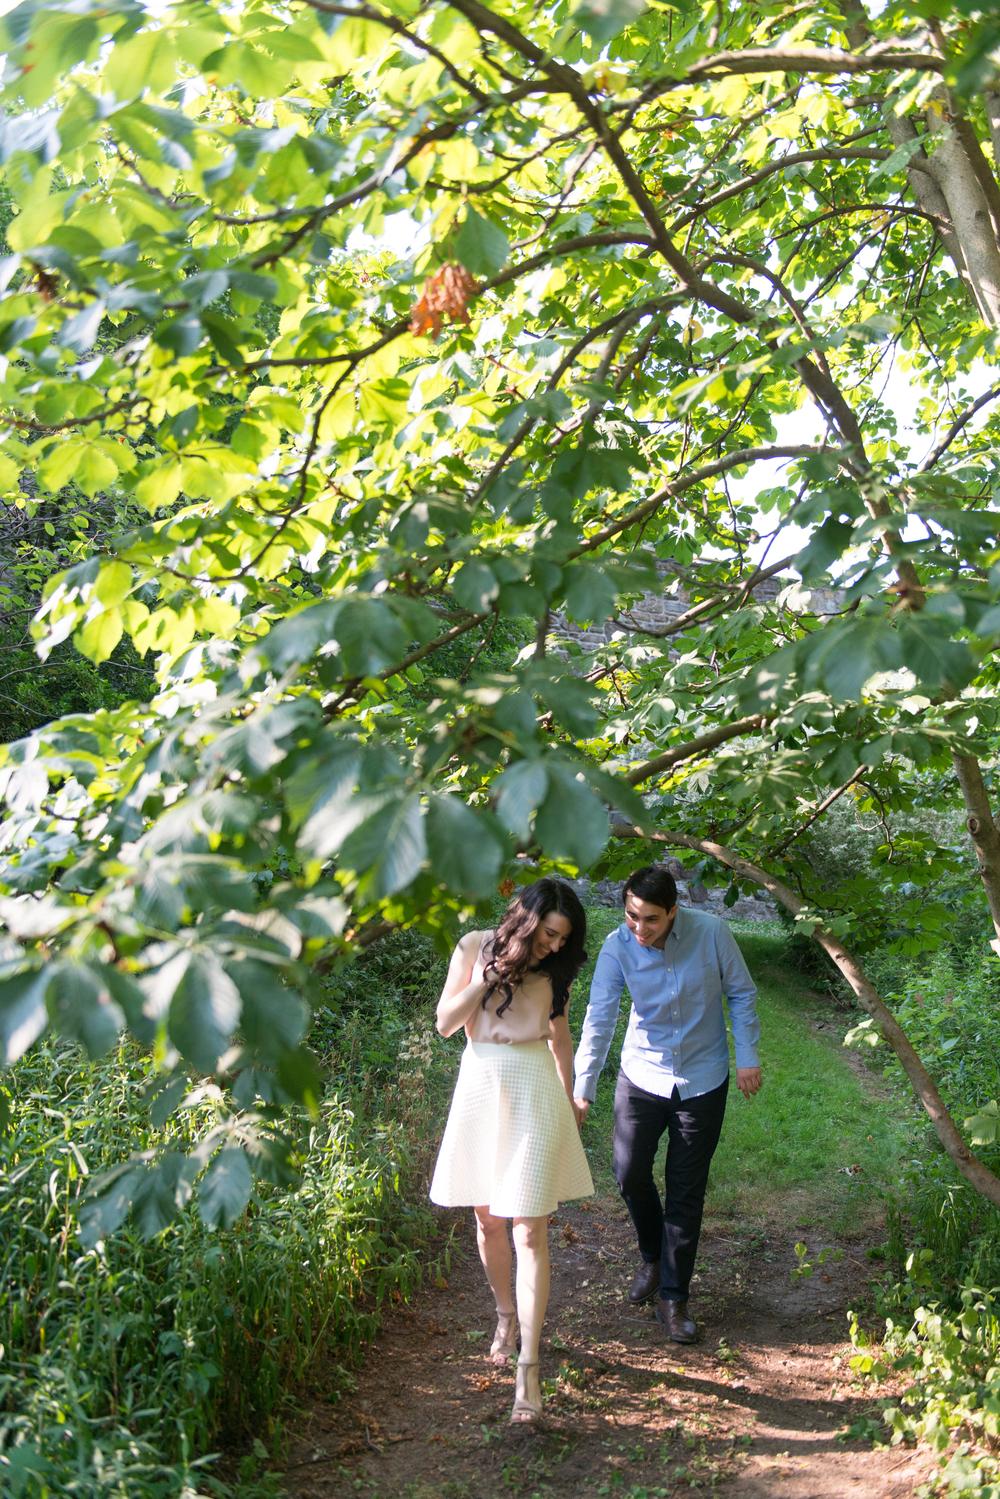 Emily&Aaron_Engagement067.JPG